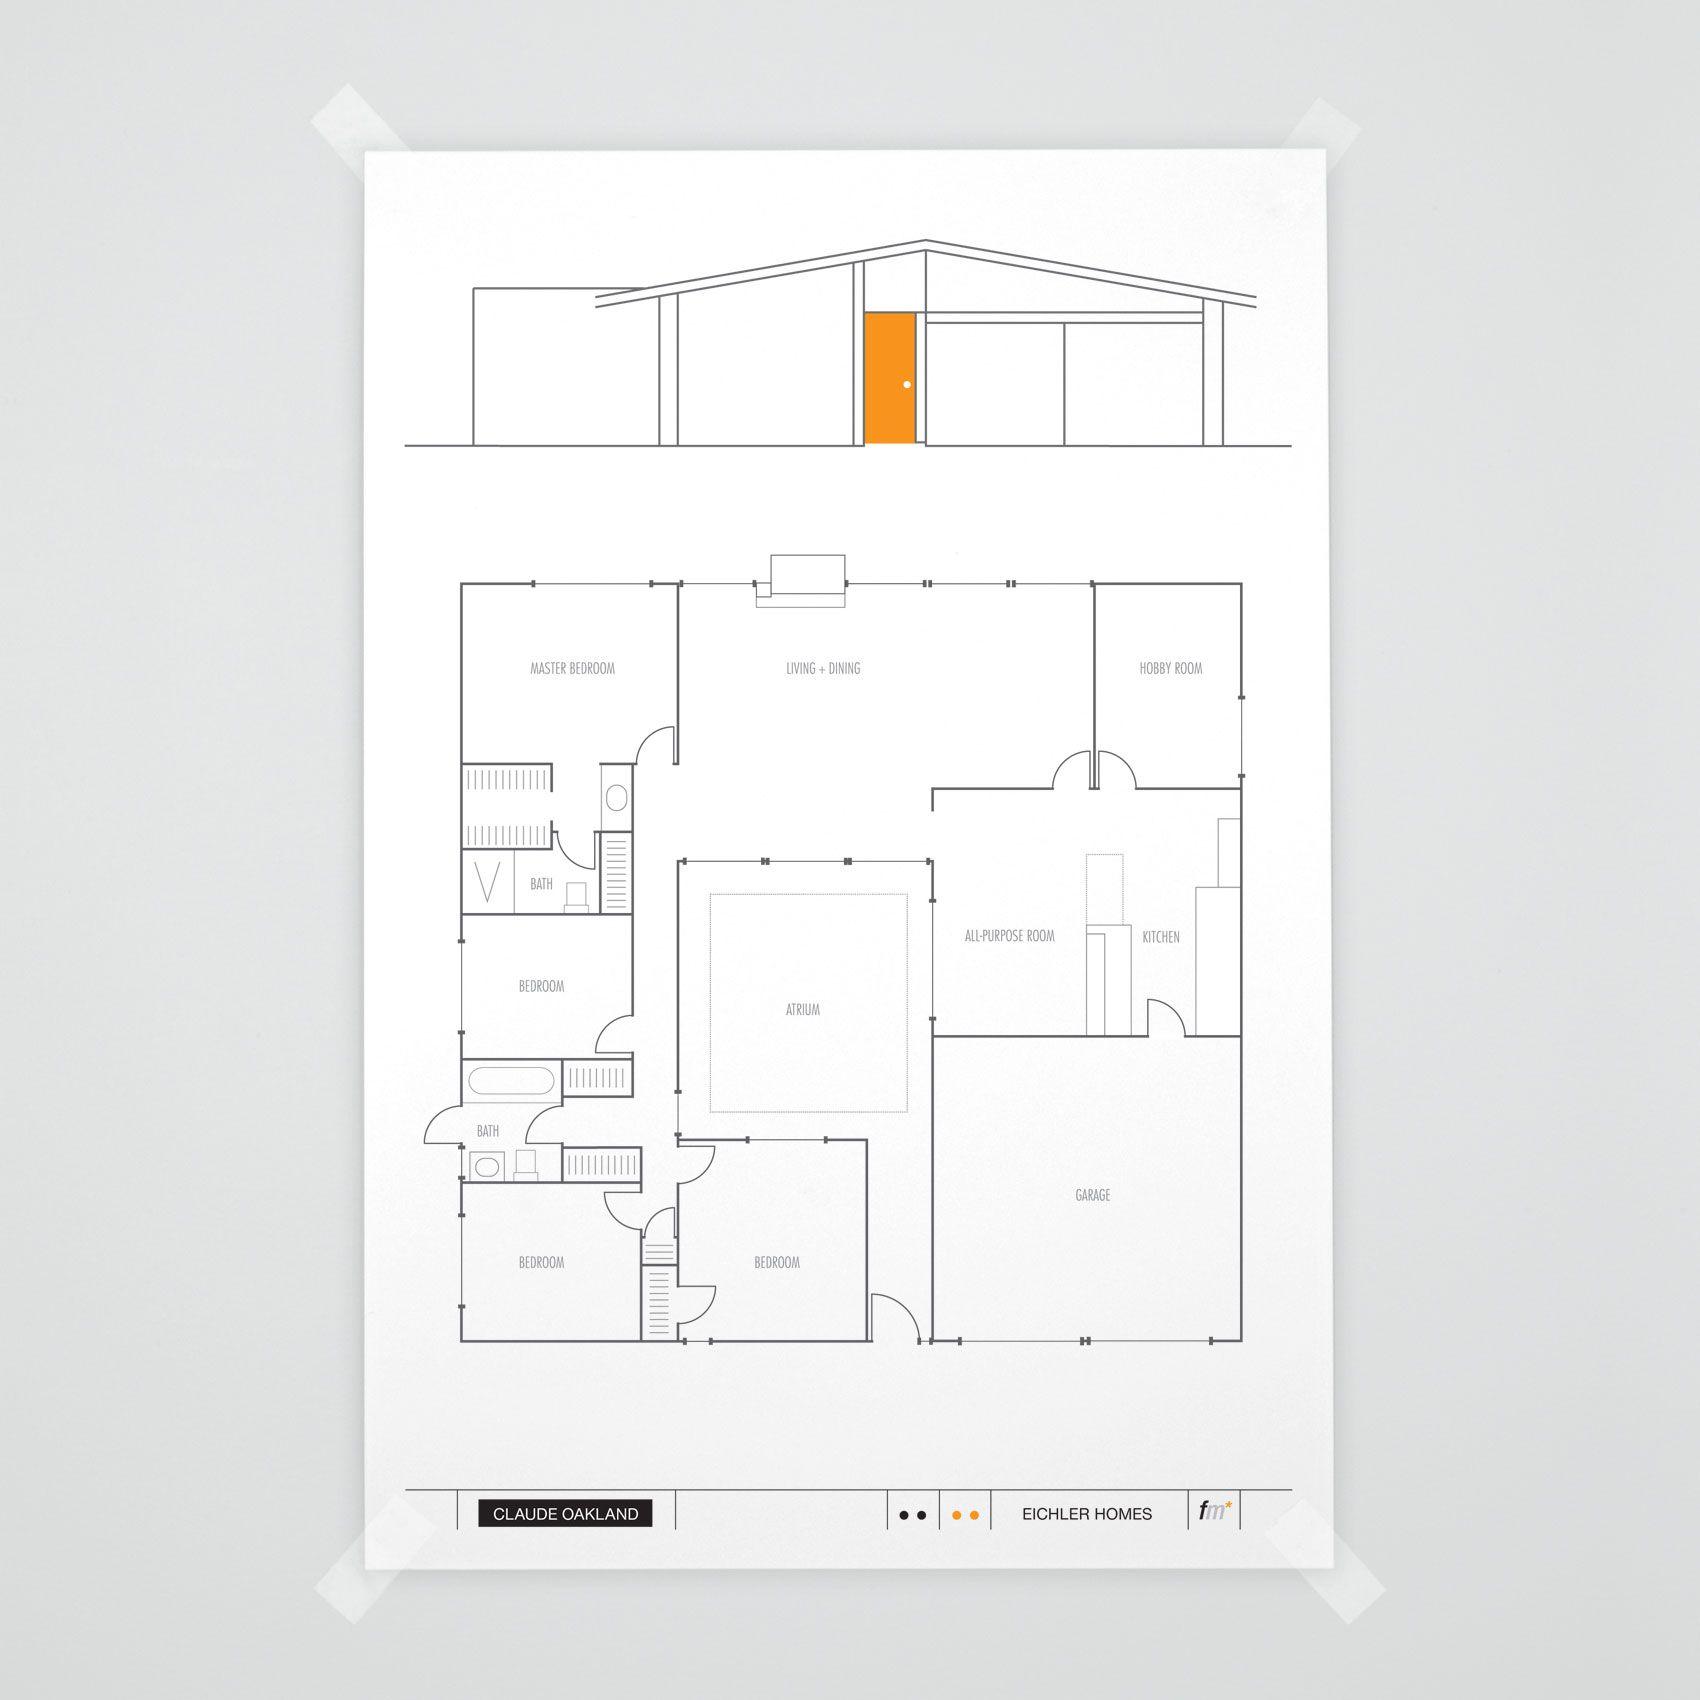 Atrium Model 2 Eichler Claude Oakland Floorplan Fogmodern Com Floor Plans Vintage House Plans Eichler Homes